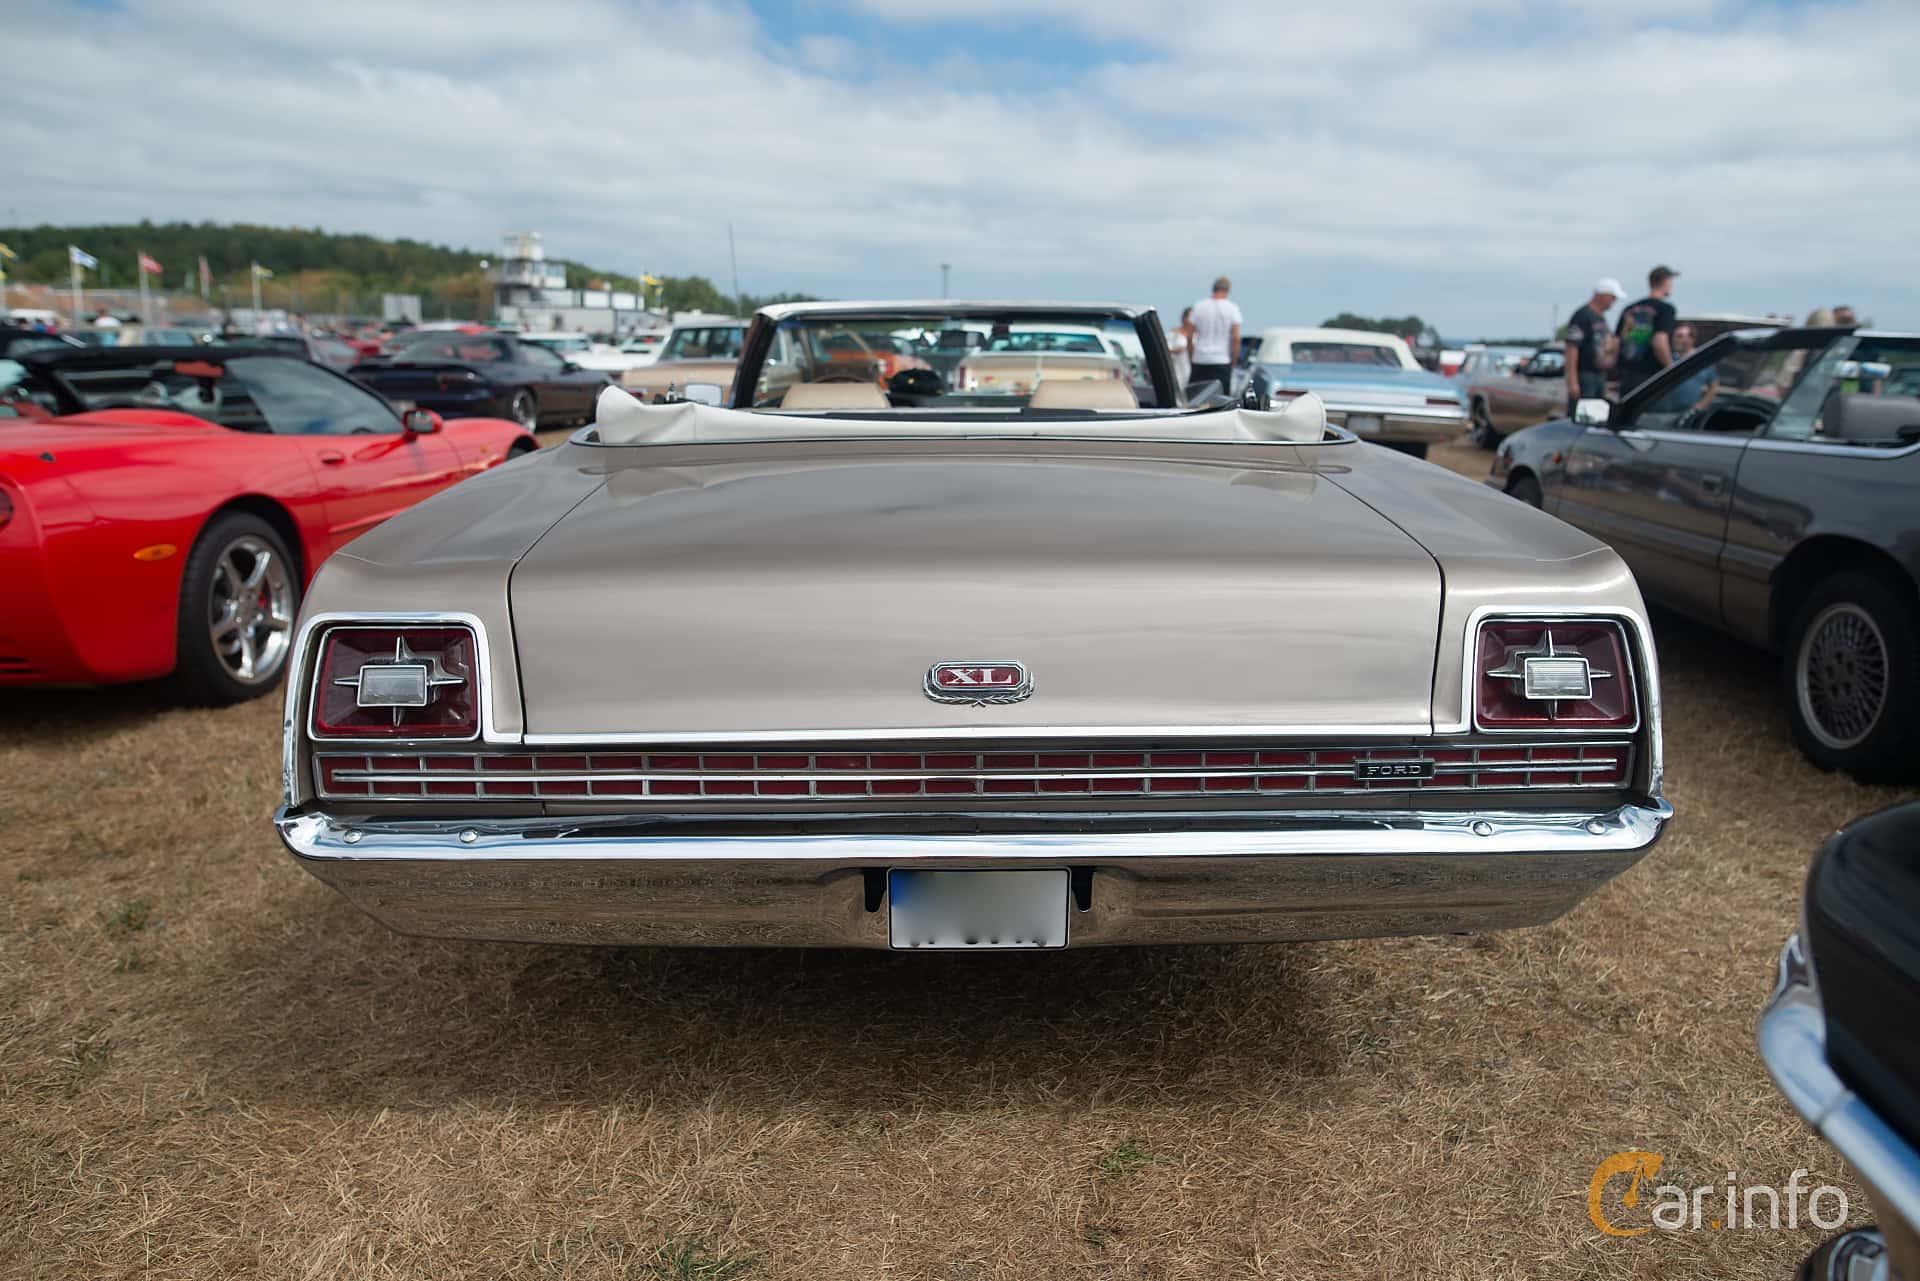 Ford XL Convertible 1969 at Wheels & Wings 2018